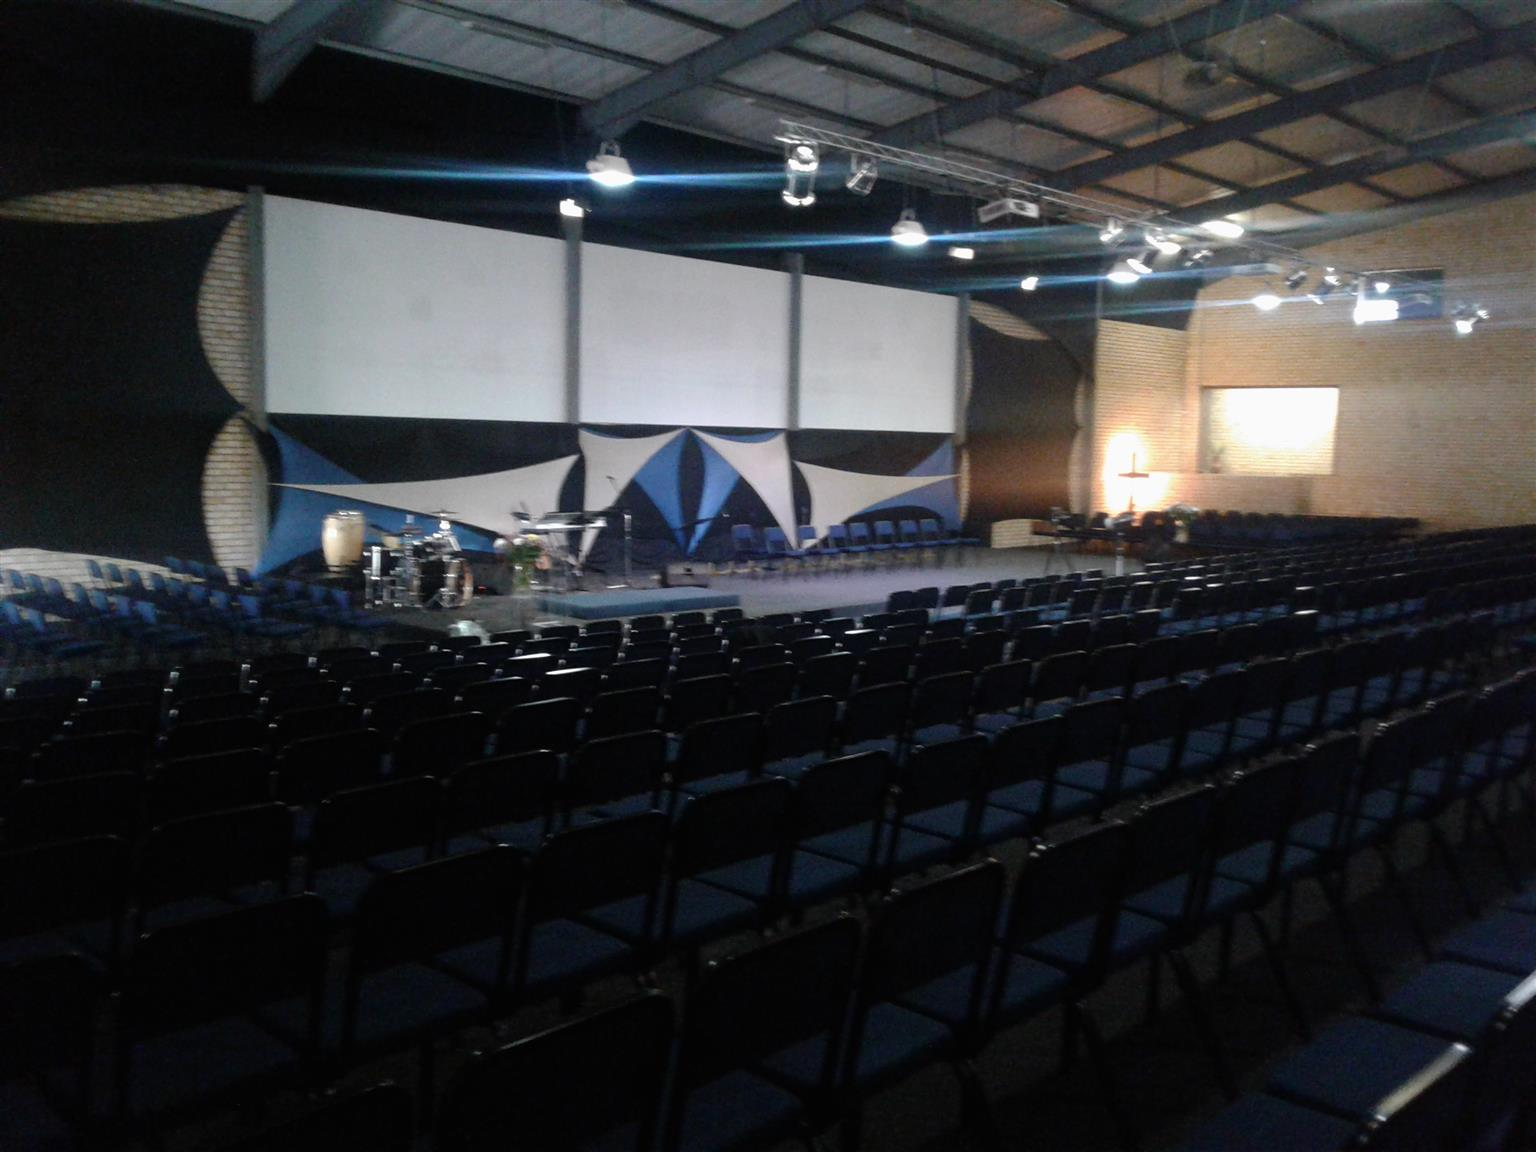 KODGS, International Bible University.  The Biggest Bible University